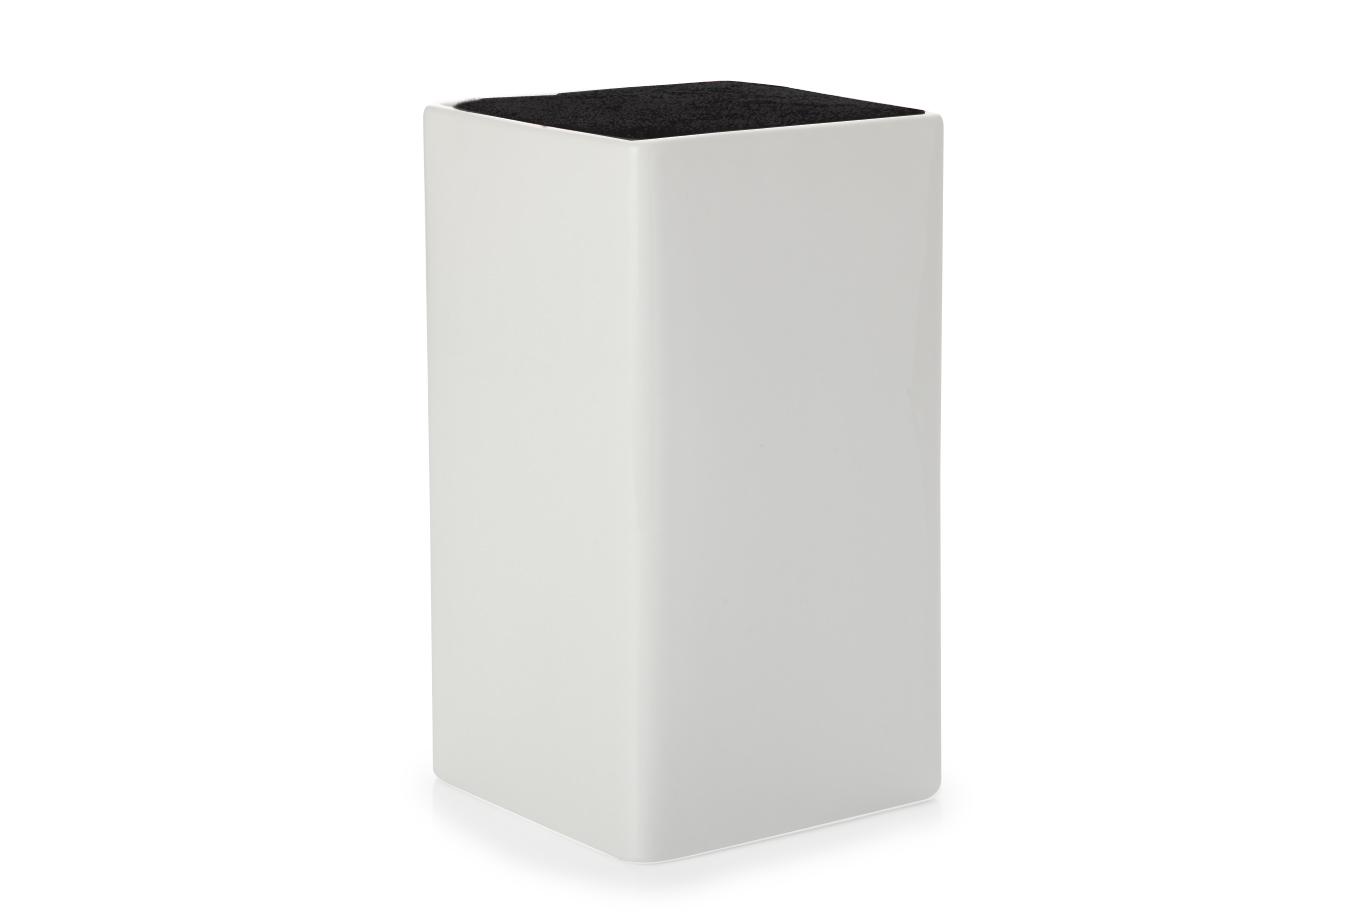 Suport pentru cutite White Basics Square Knife Block Alb/Negru, Portelan